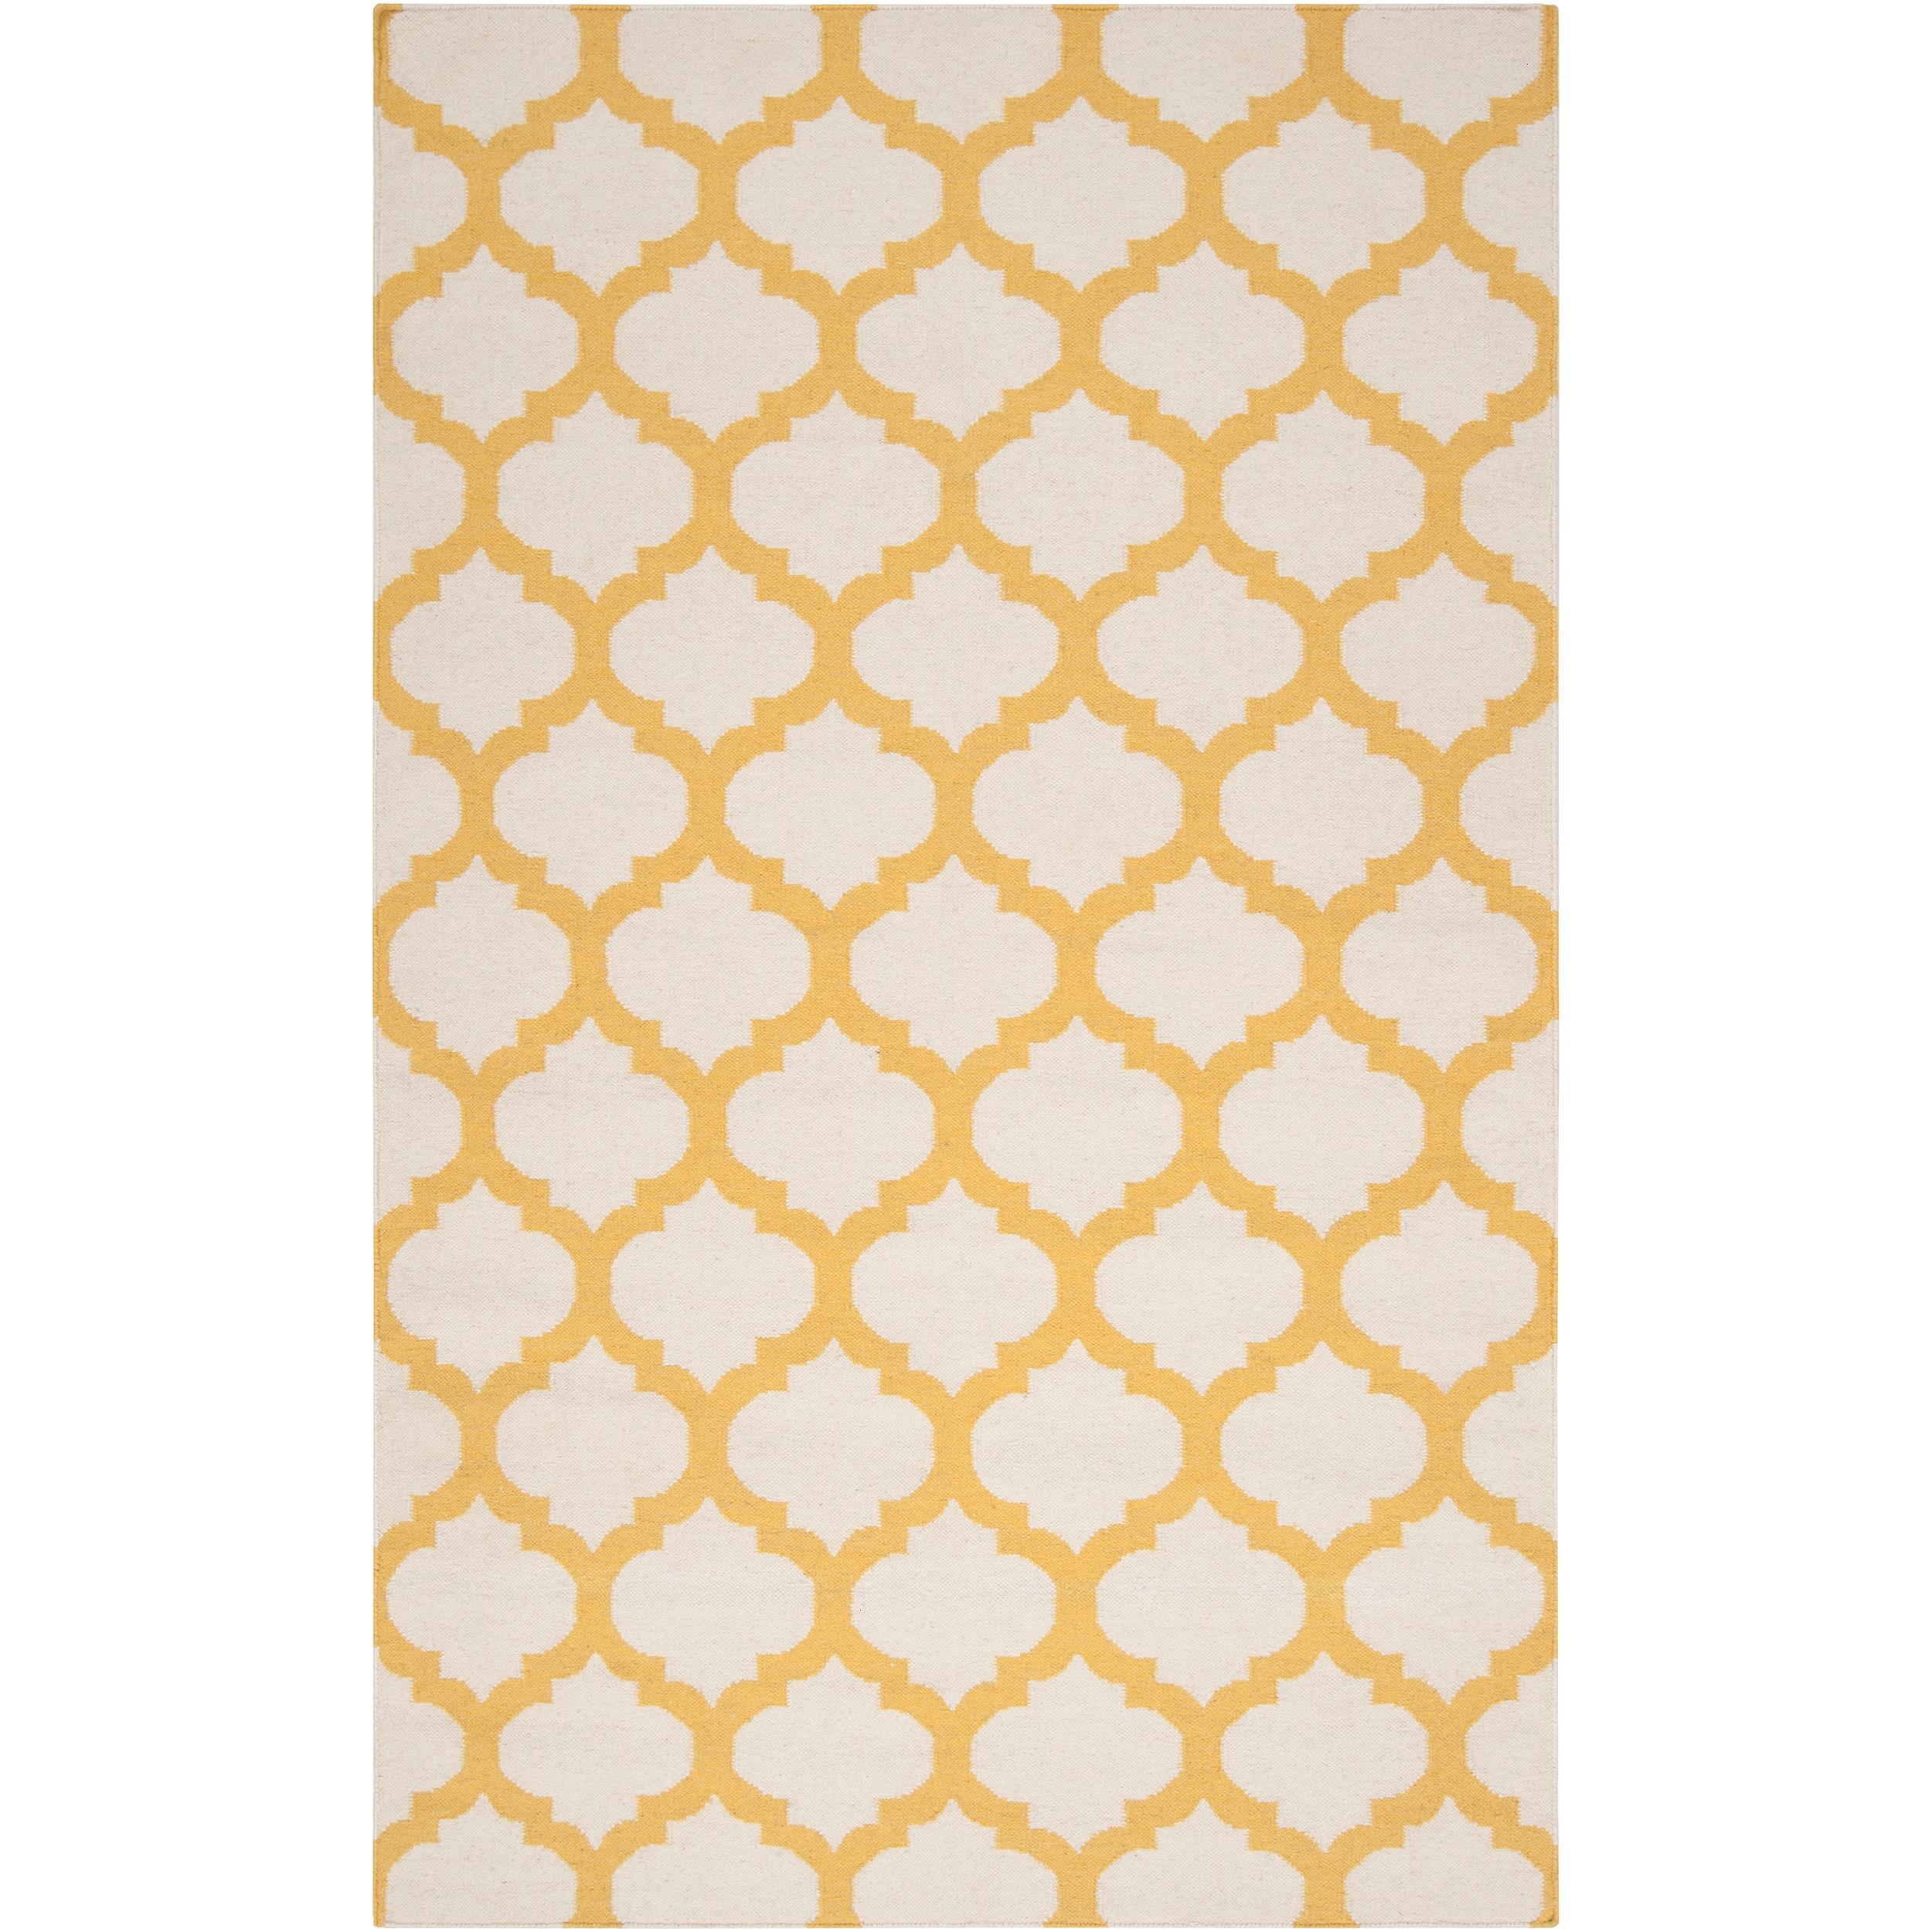 Hand-woven Yellow Caroni Wool Area Rug (3'6 x 5'6)